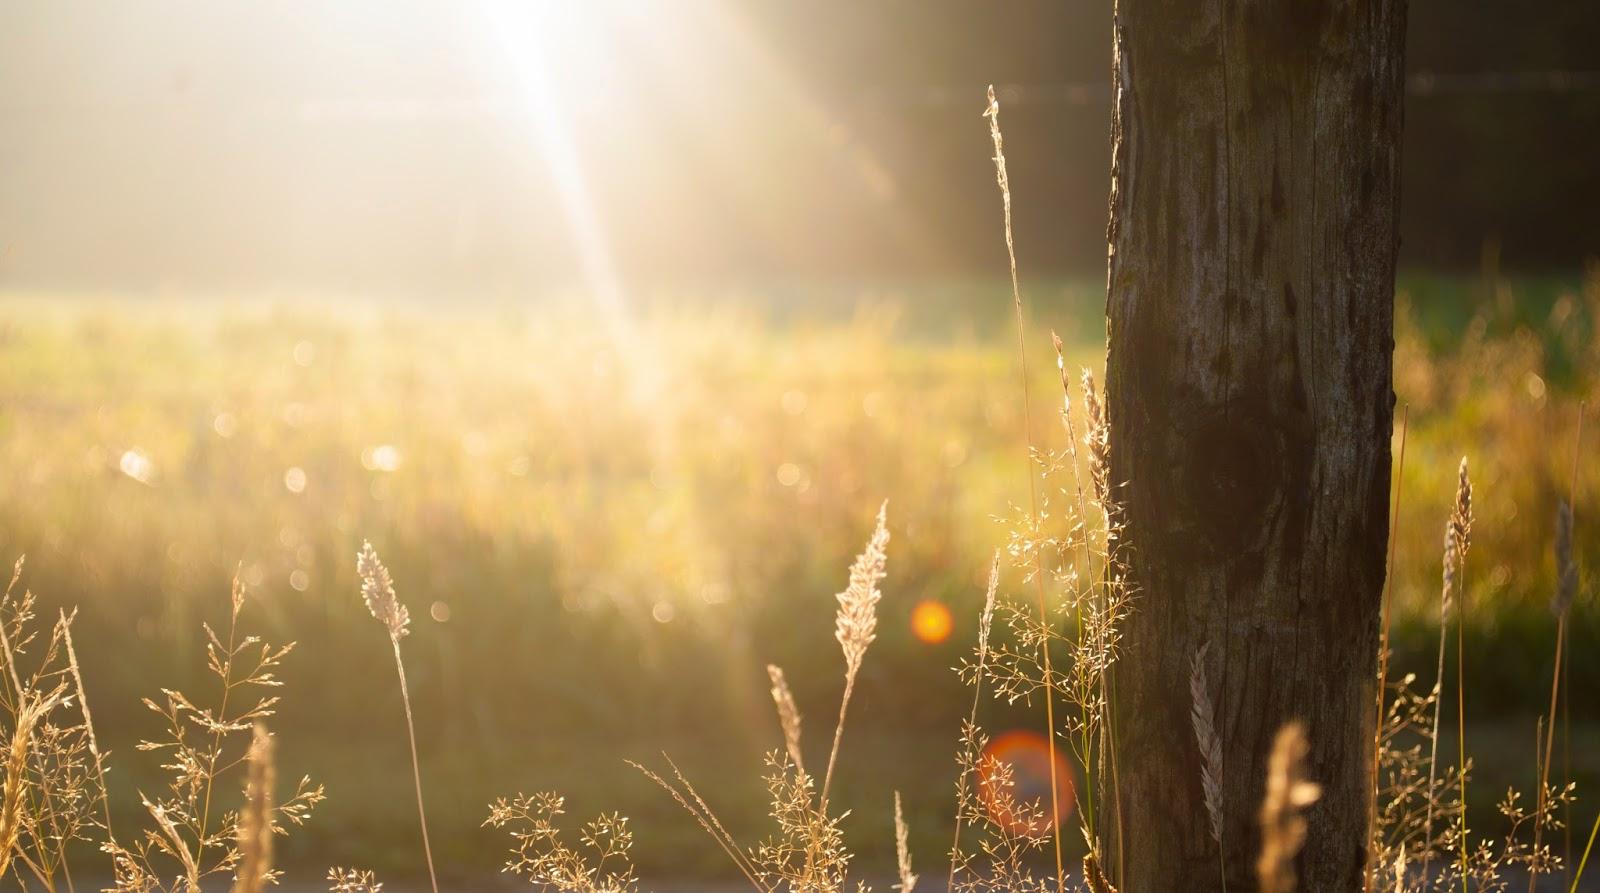 Poetry: Morning Prayer